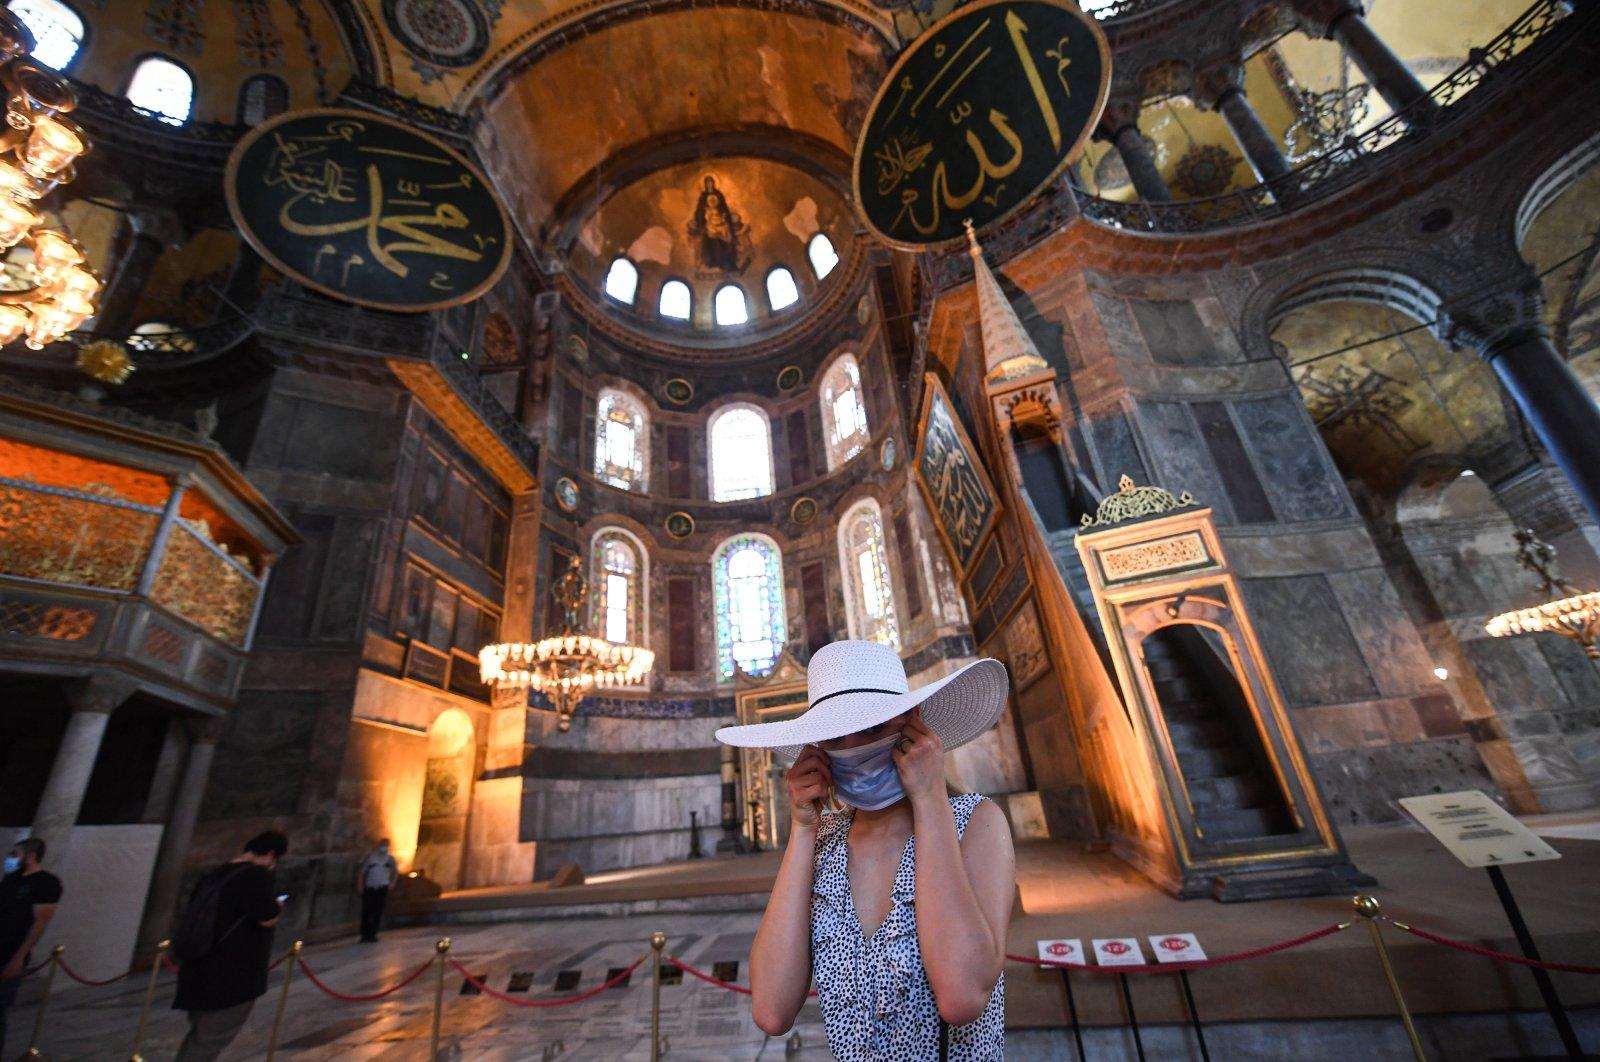 A tourist visits the inside of Hagia Sophia, Istanbul, Turkey, July 10, 2020. (AFP Photo)